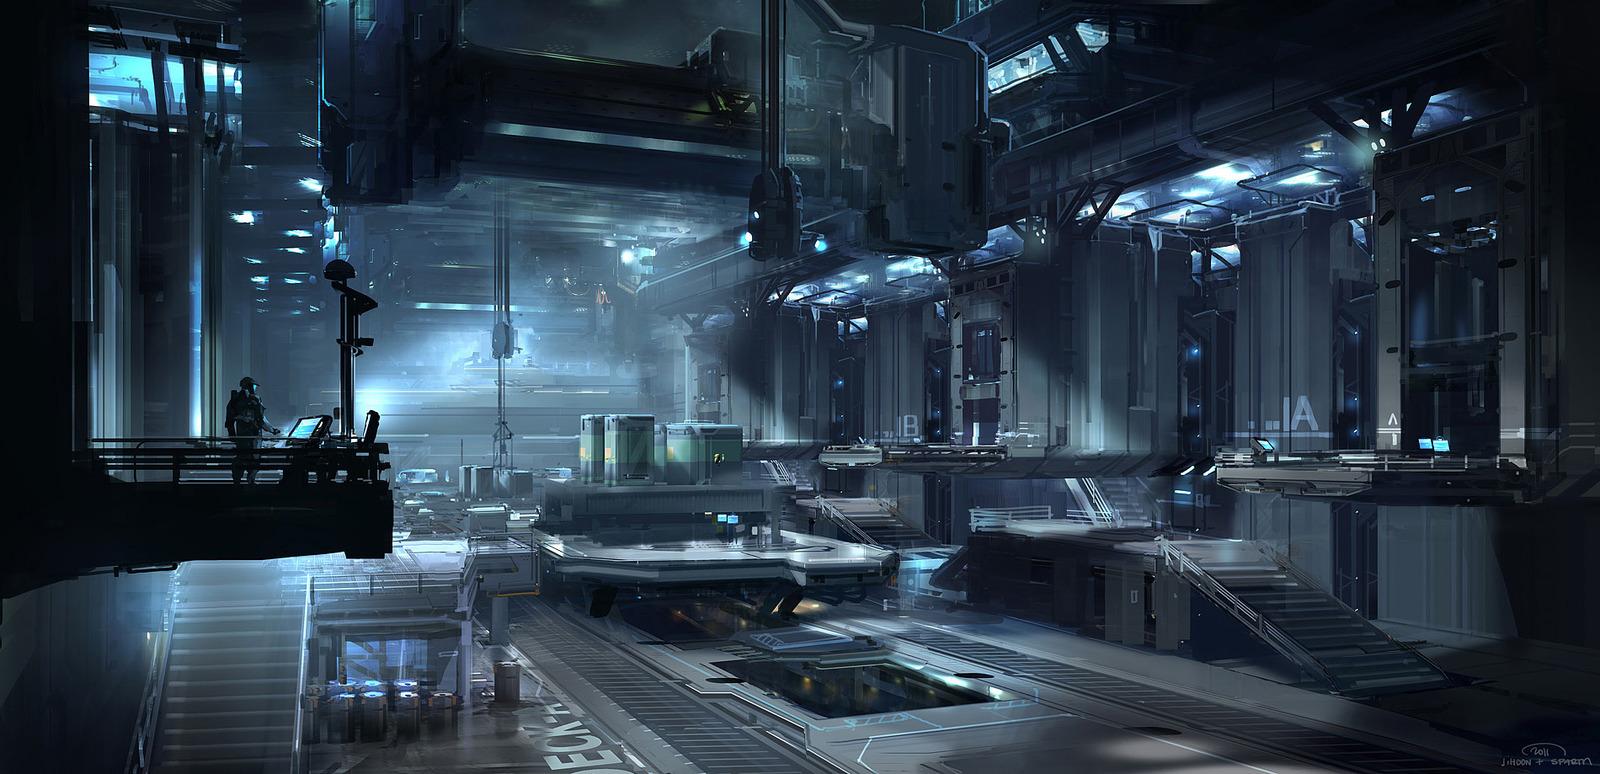 Sparth Sci Fi Concept Artist The Amazing Artwork Of